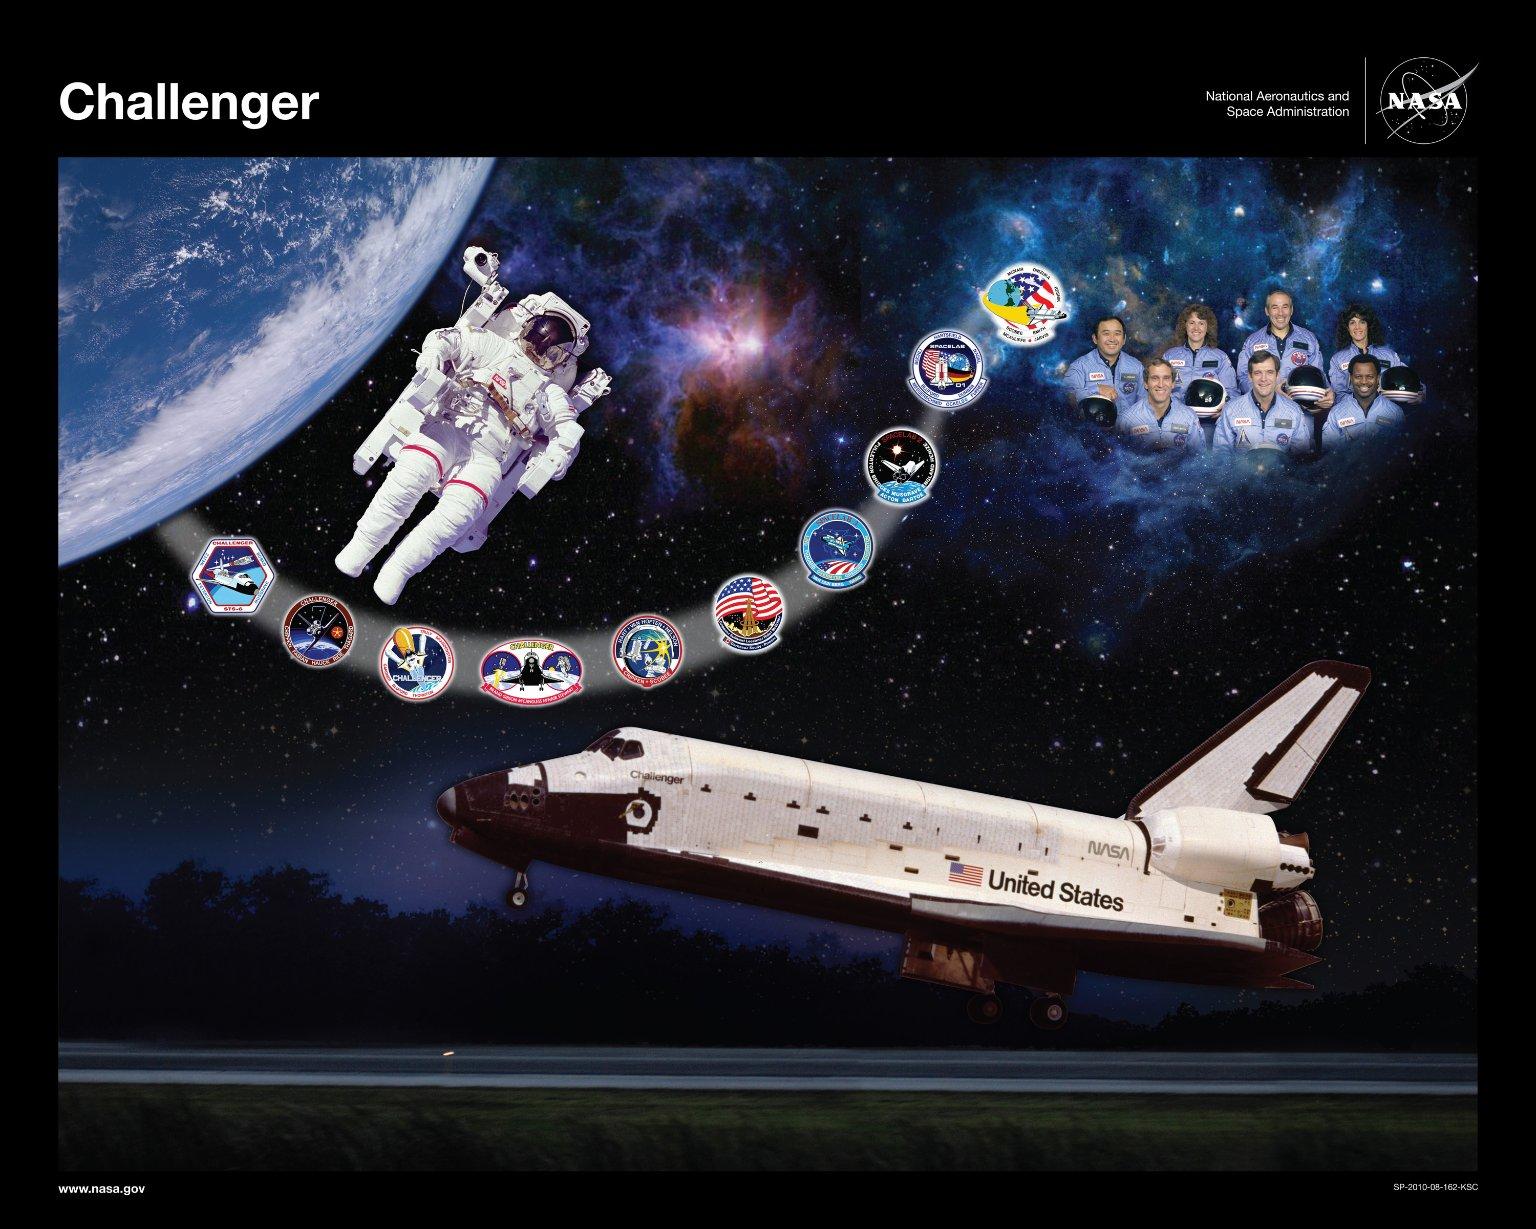 space shuttle challenger cockpit audio - photo #26